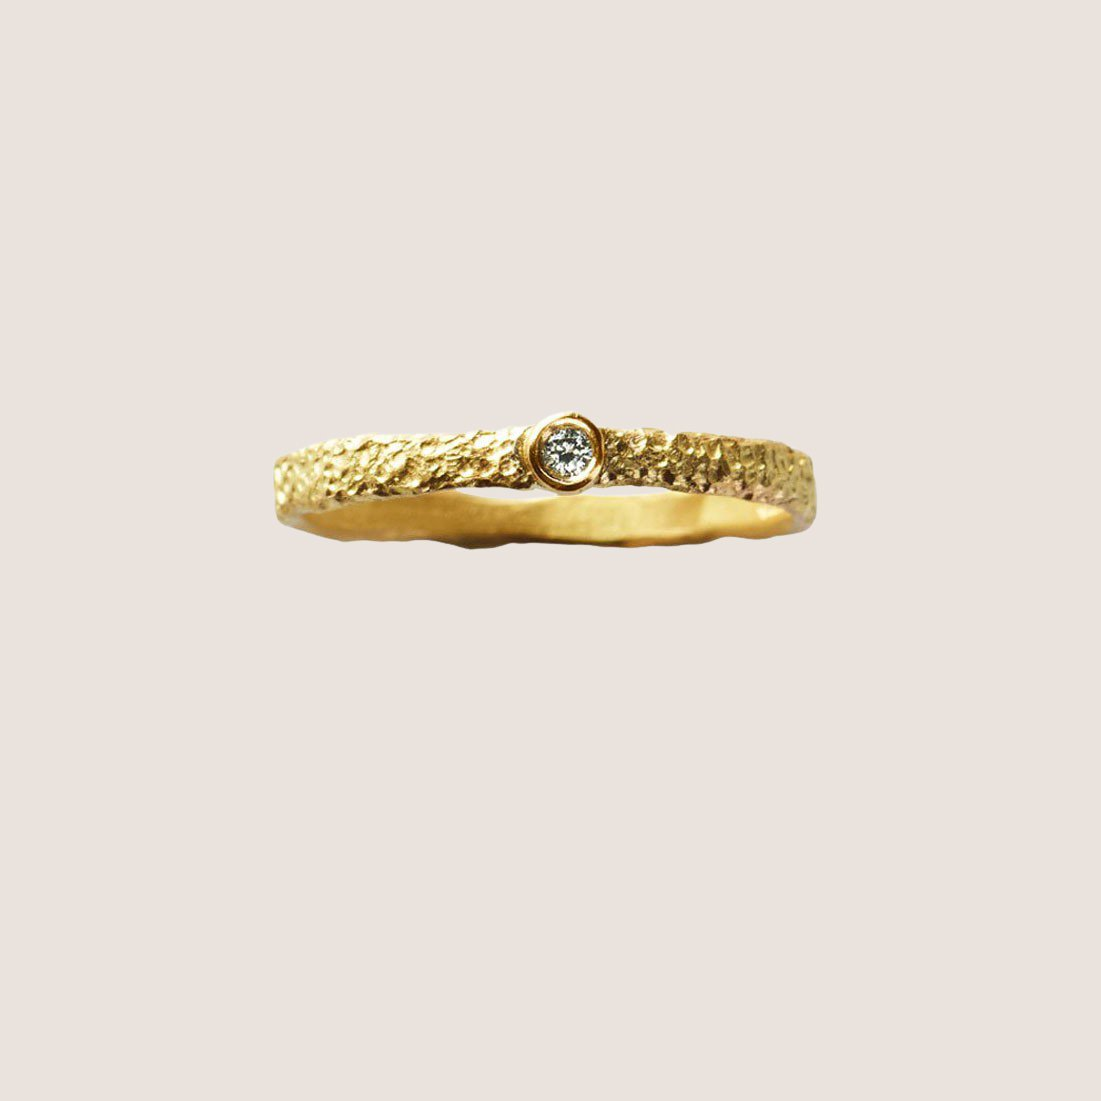 Petite Love Ring